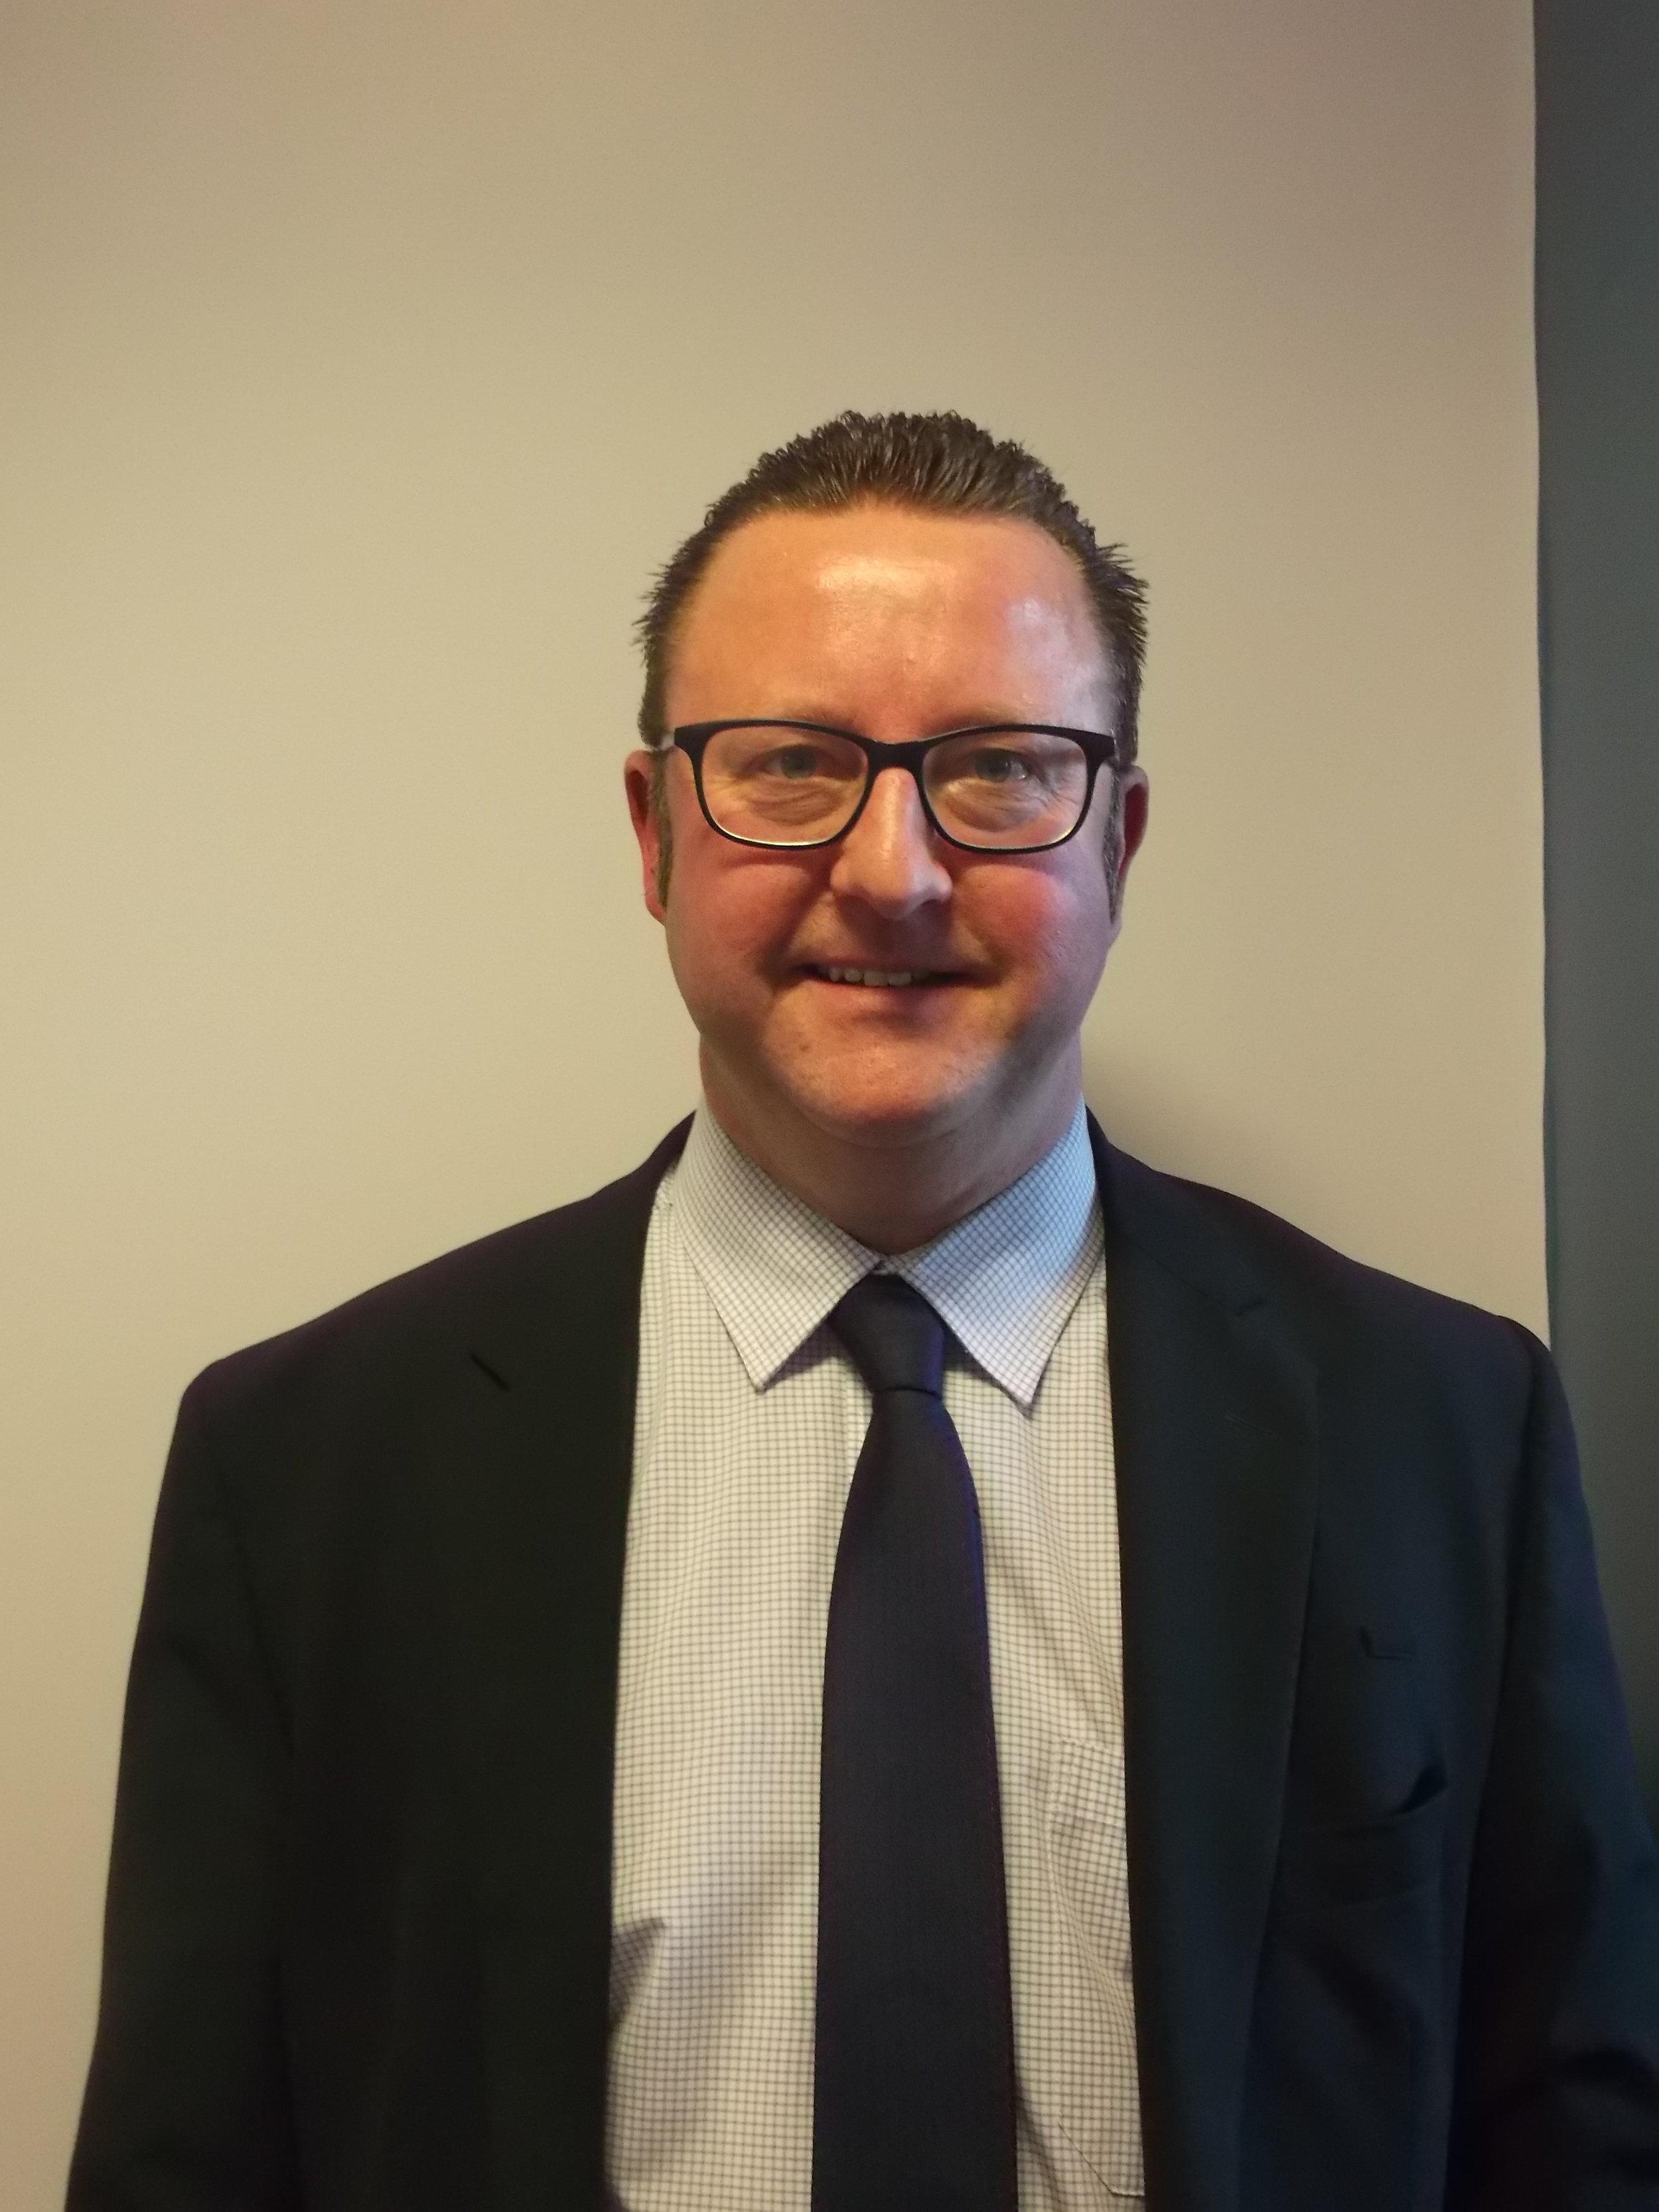 Simon Grove - Trustee & Member